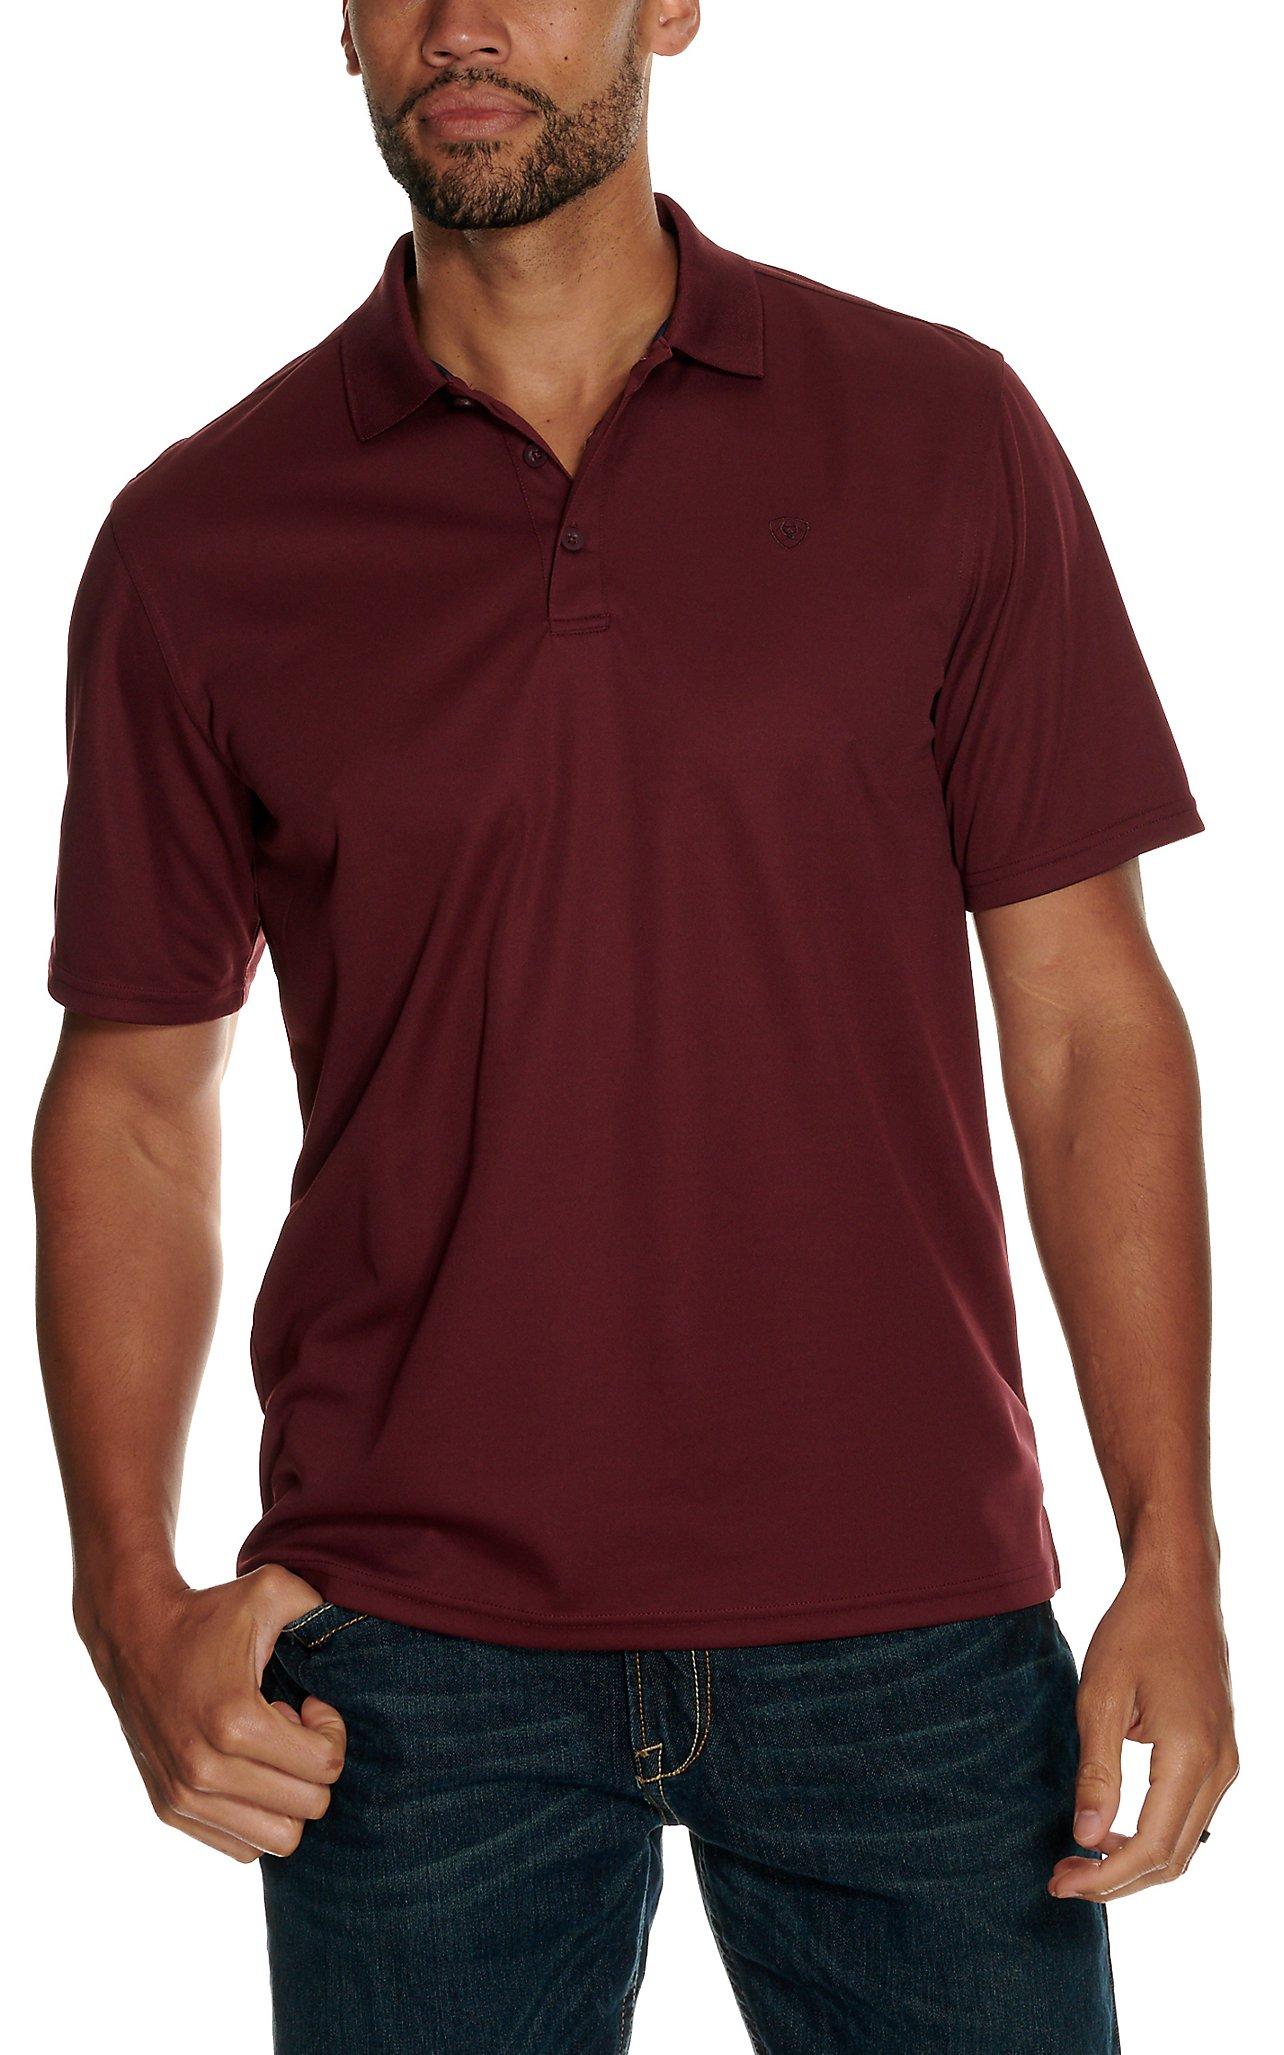 Ariat Mens Maroon Heat Series Tek Polo Shirt Cavenders